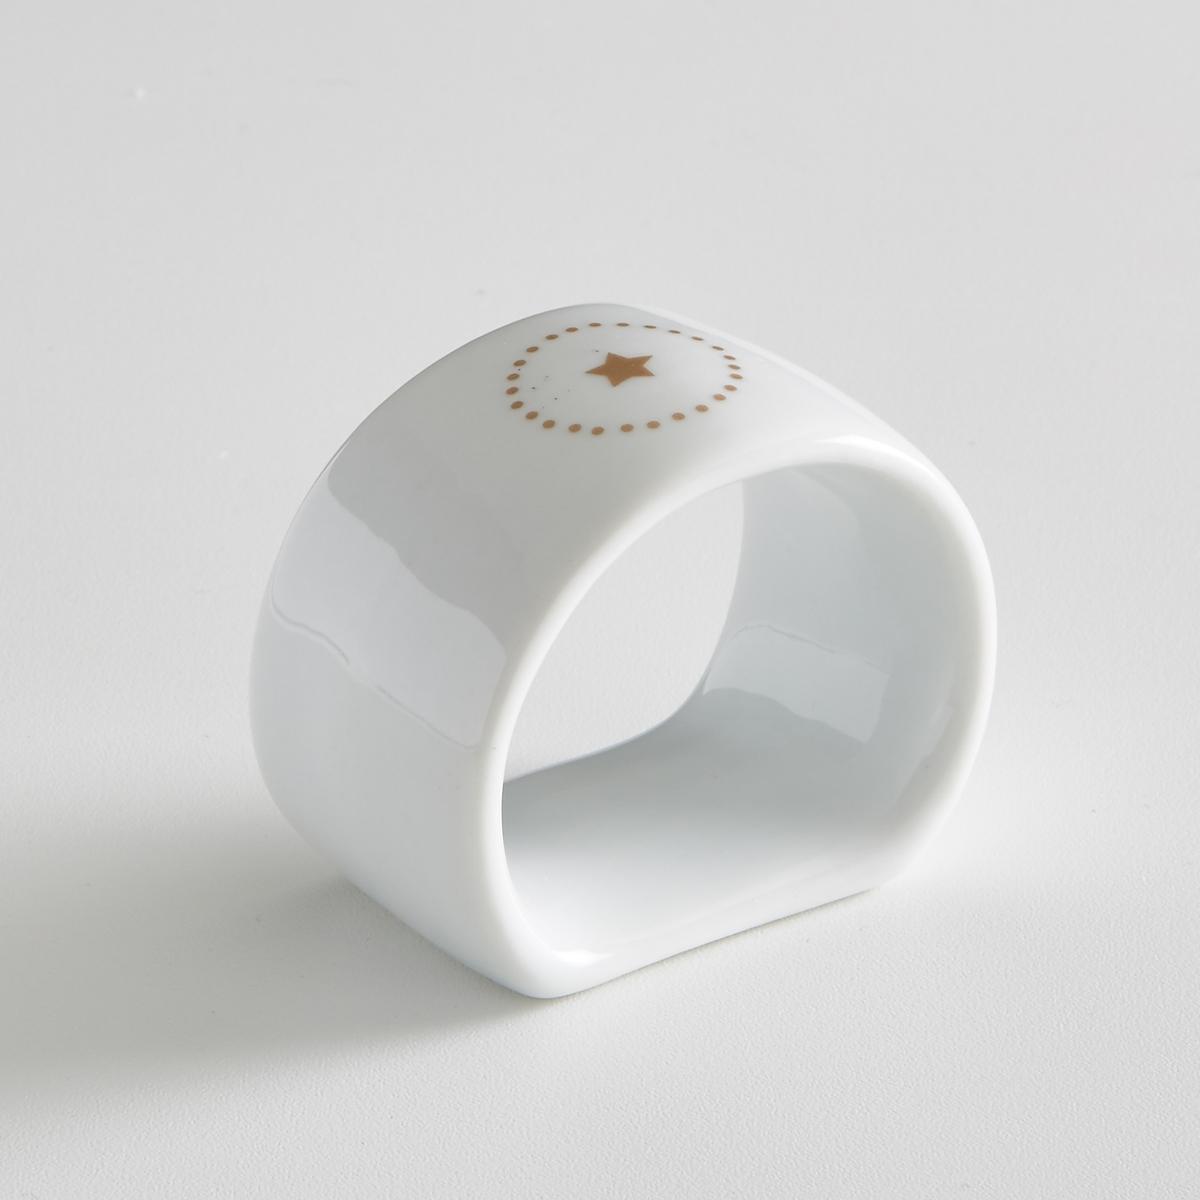 4 кольца для салфеток из фарфора Kubler